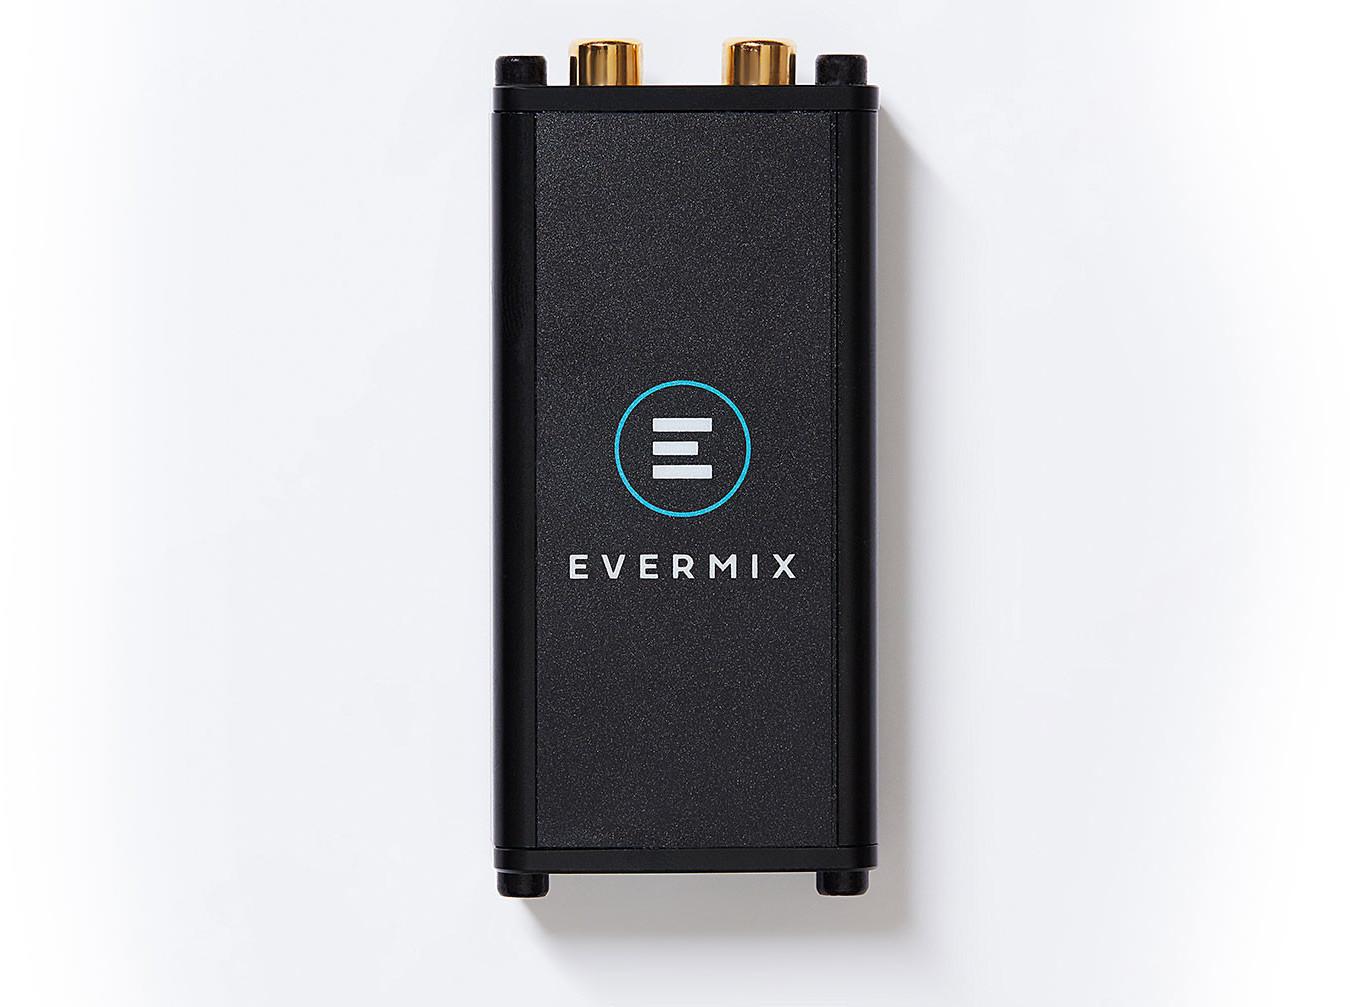 Image of Evermix EvermixBox4 iOS